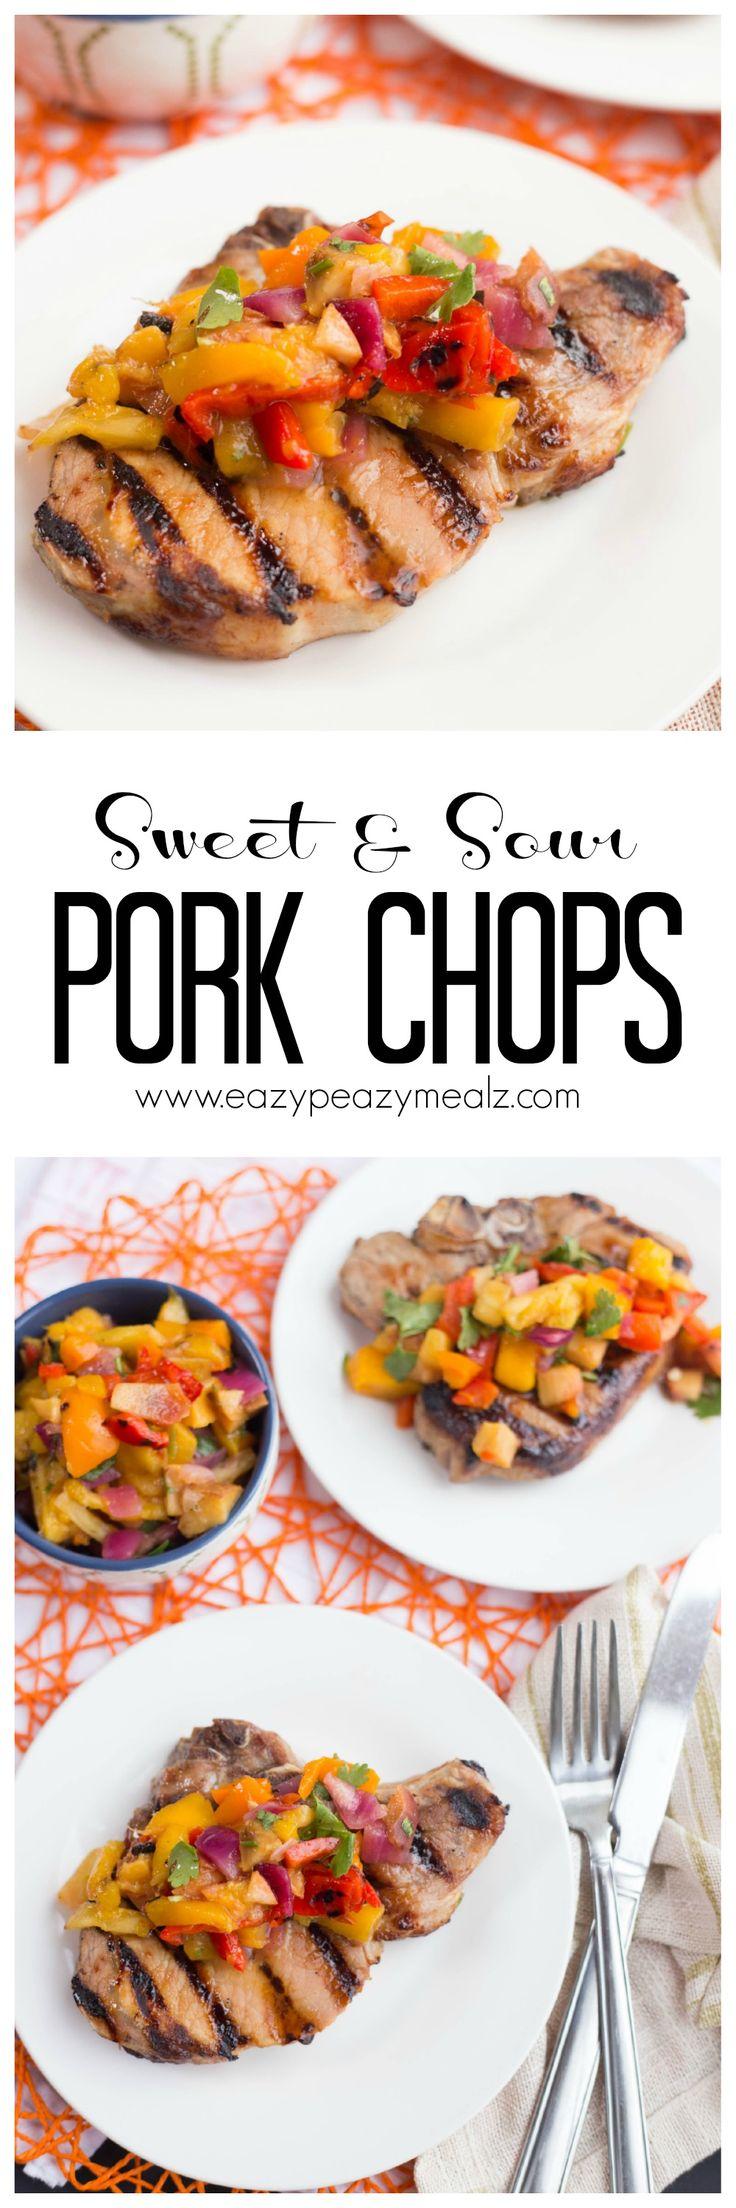 about pork on Pinterest | Pork chops, Pulled pork and Pork tenderloins ...